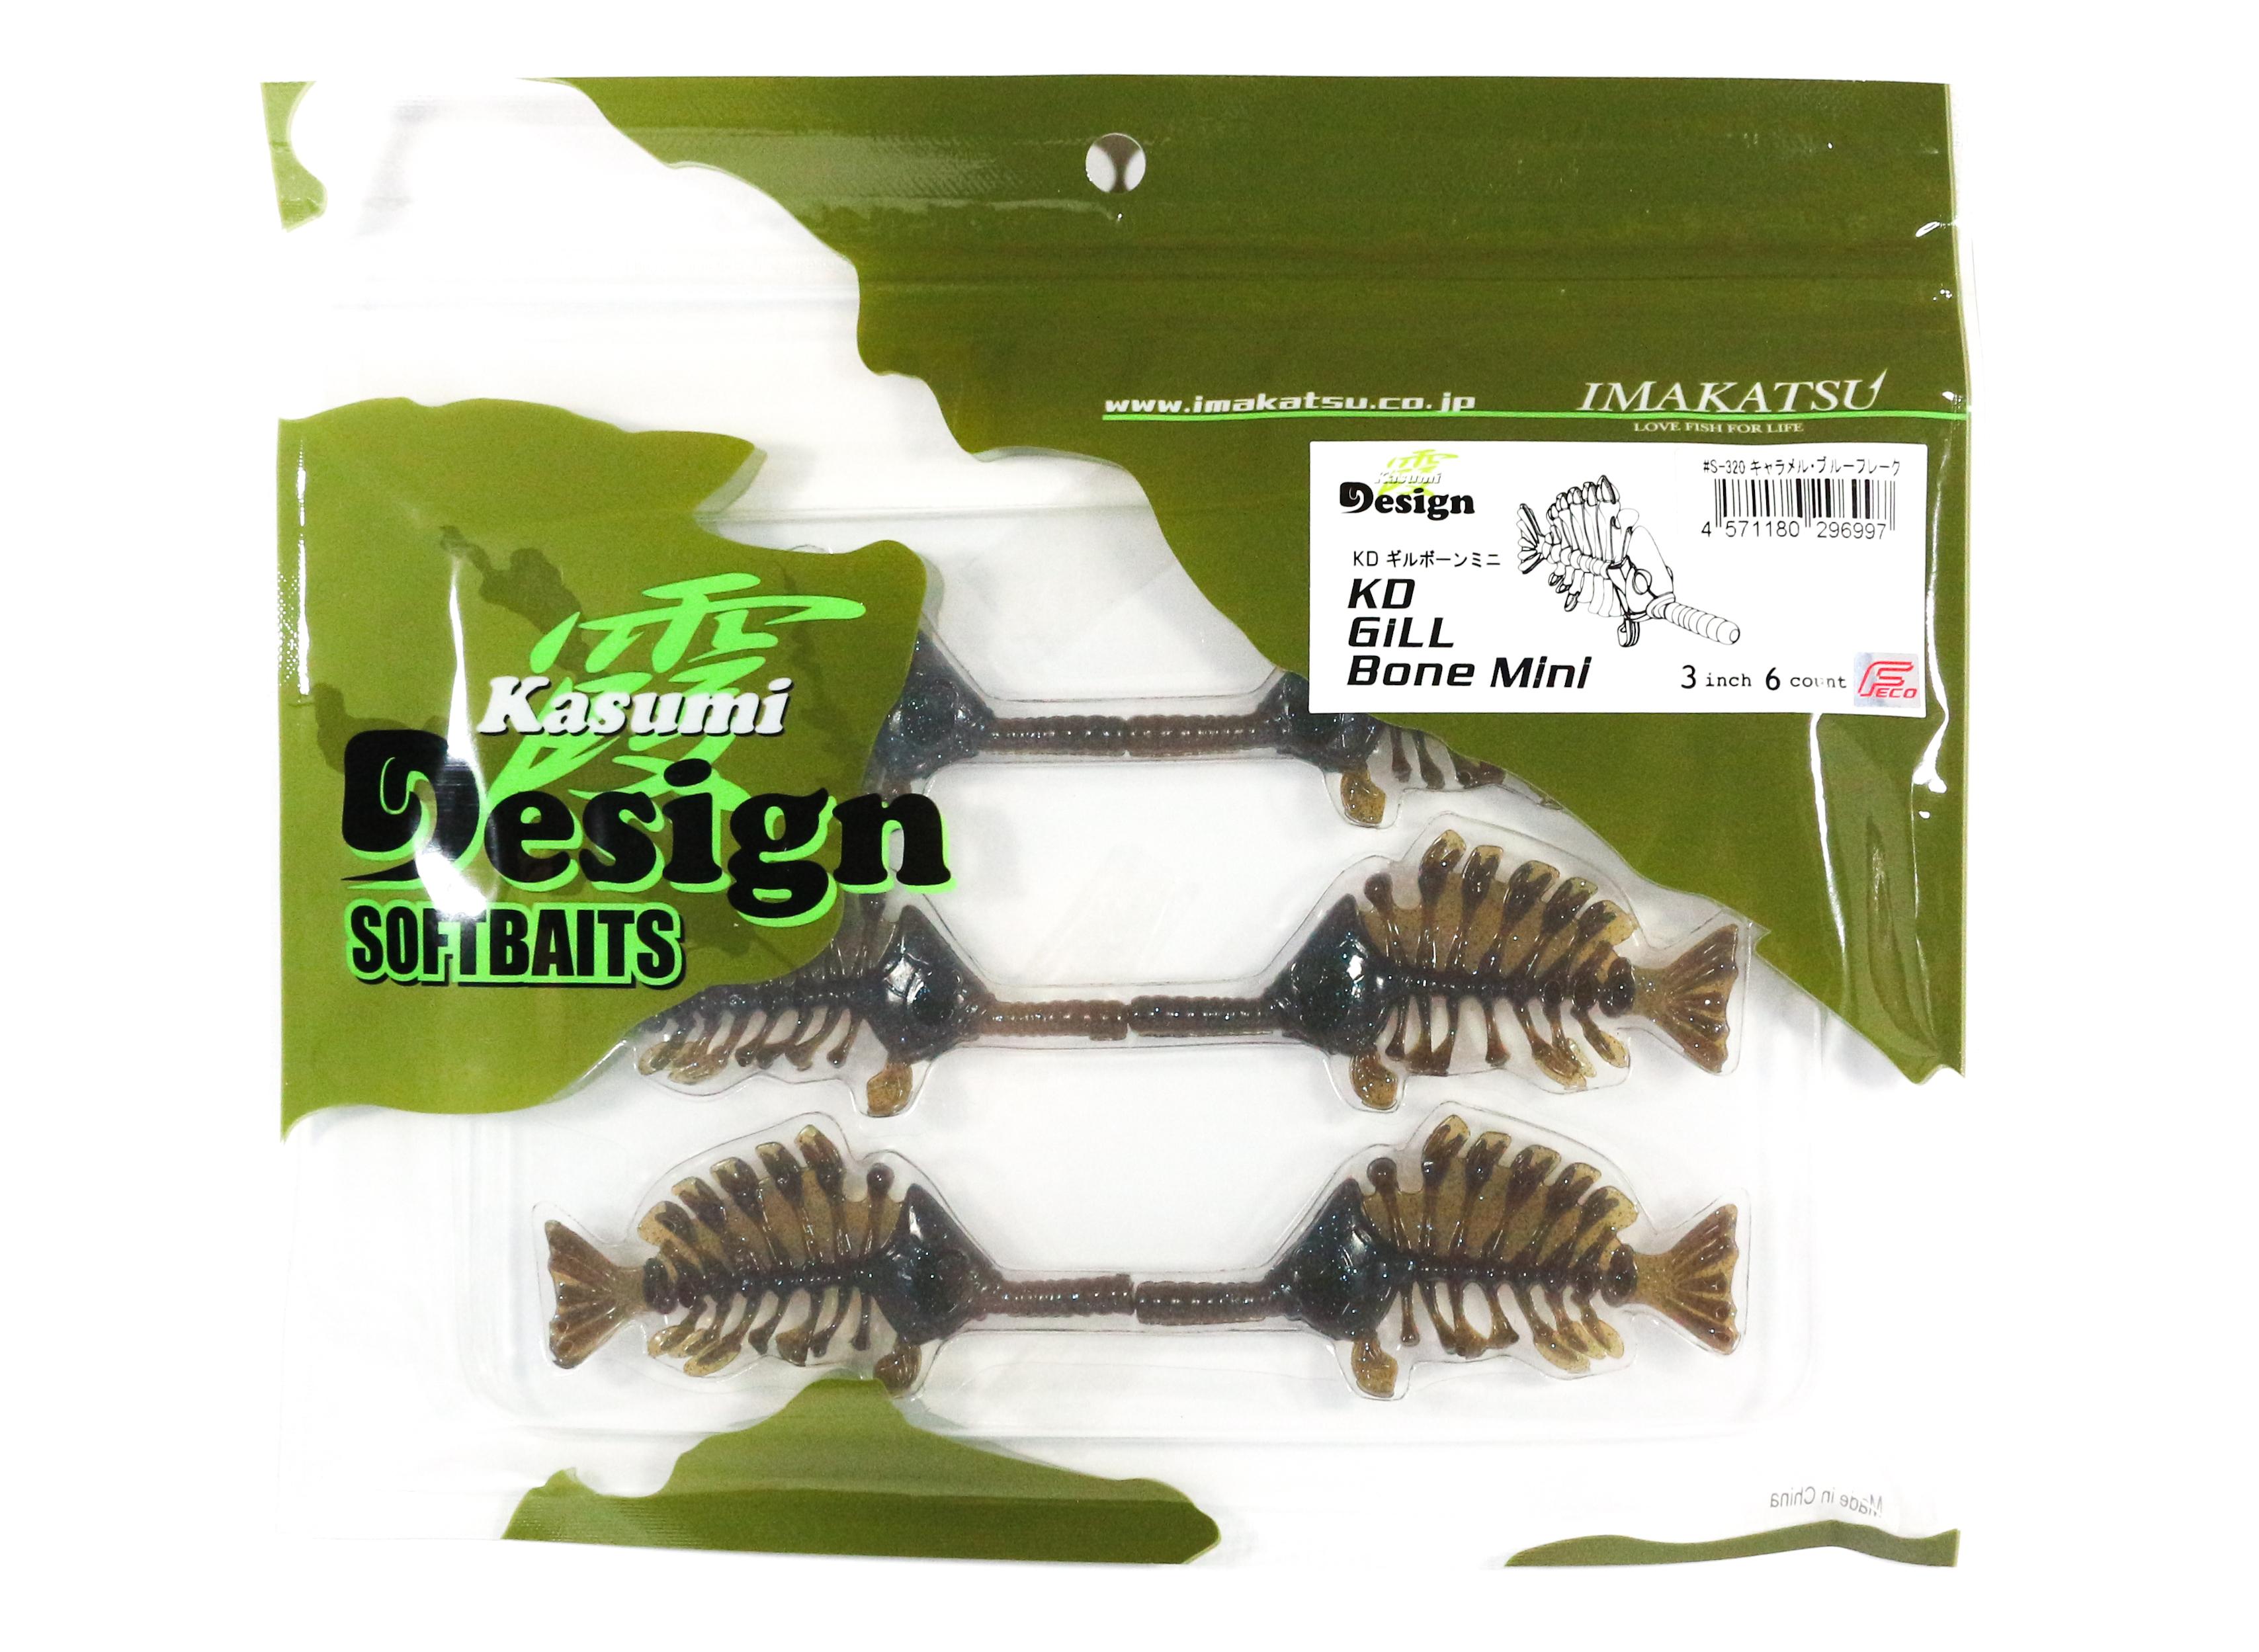 Sale Imakatsu Soft Lure Gill Bone Mini 3 Inches S-320 (6997)